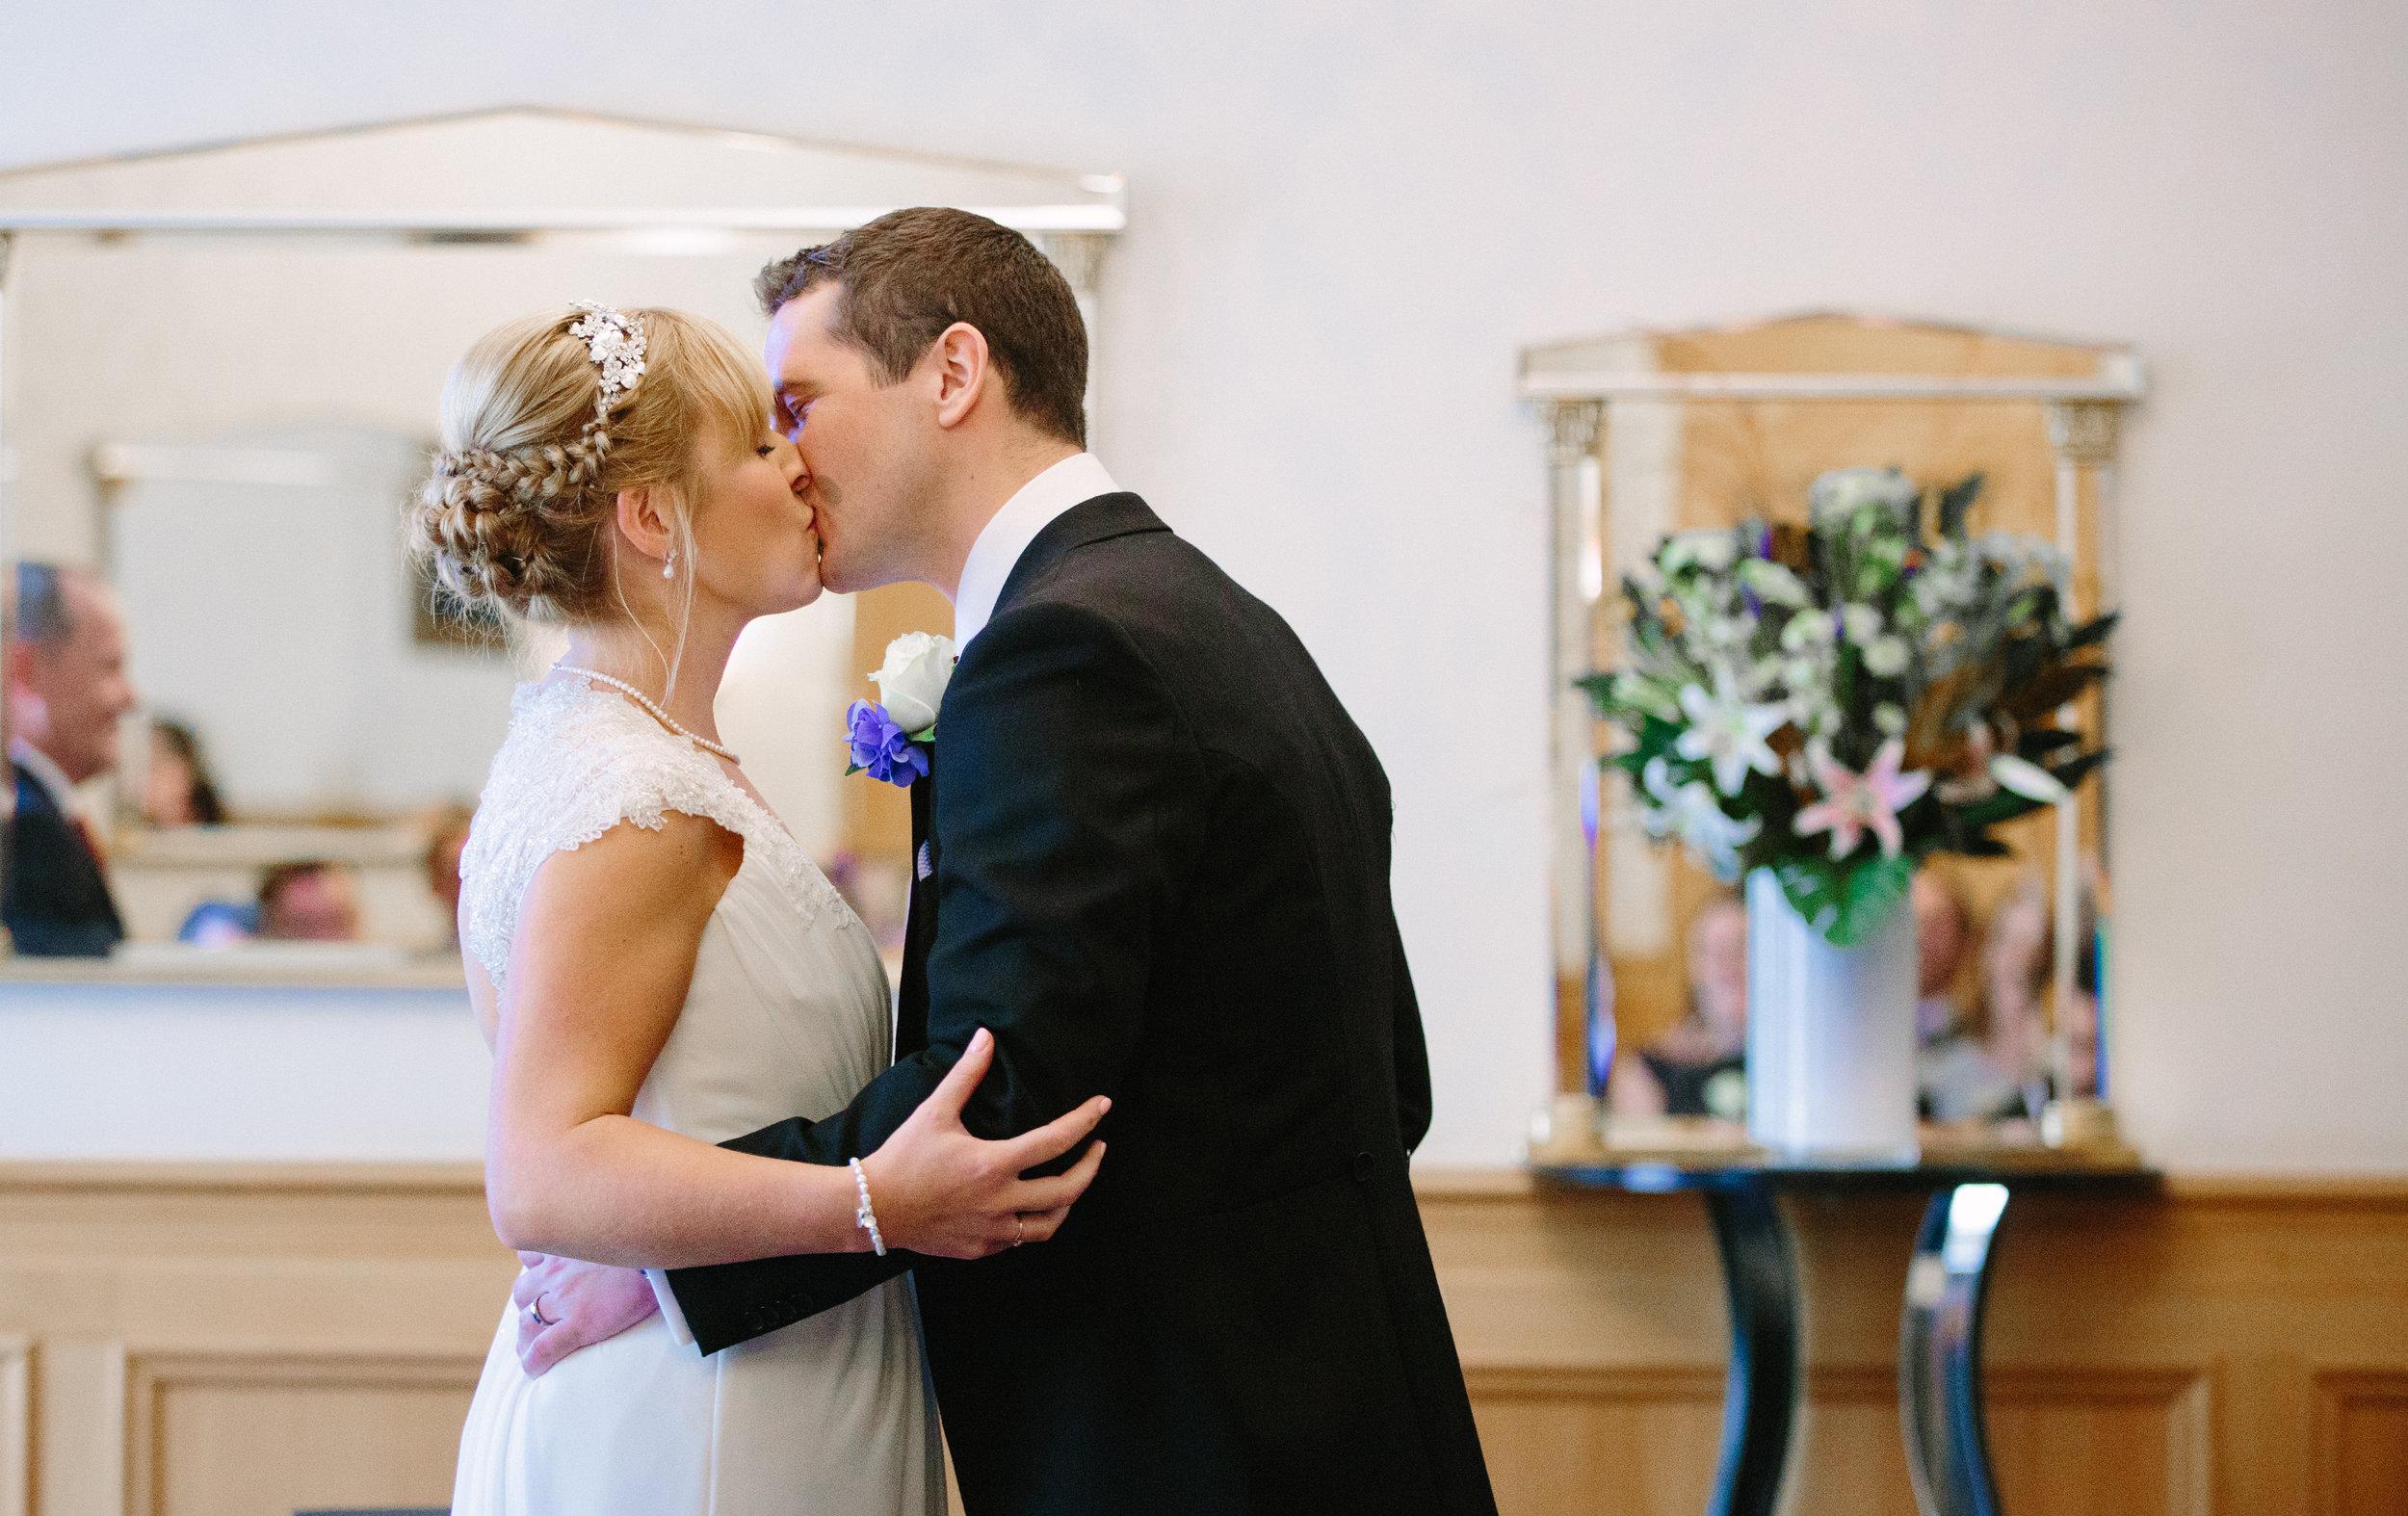 london-wedding-photography-wimbledon-wandsworth-town-hall-savoy-hotel-first-kiss-35